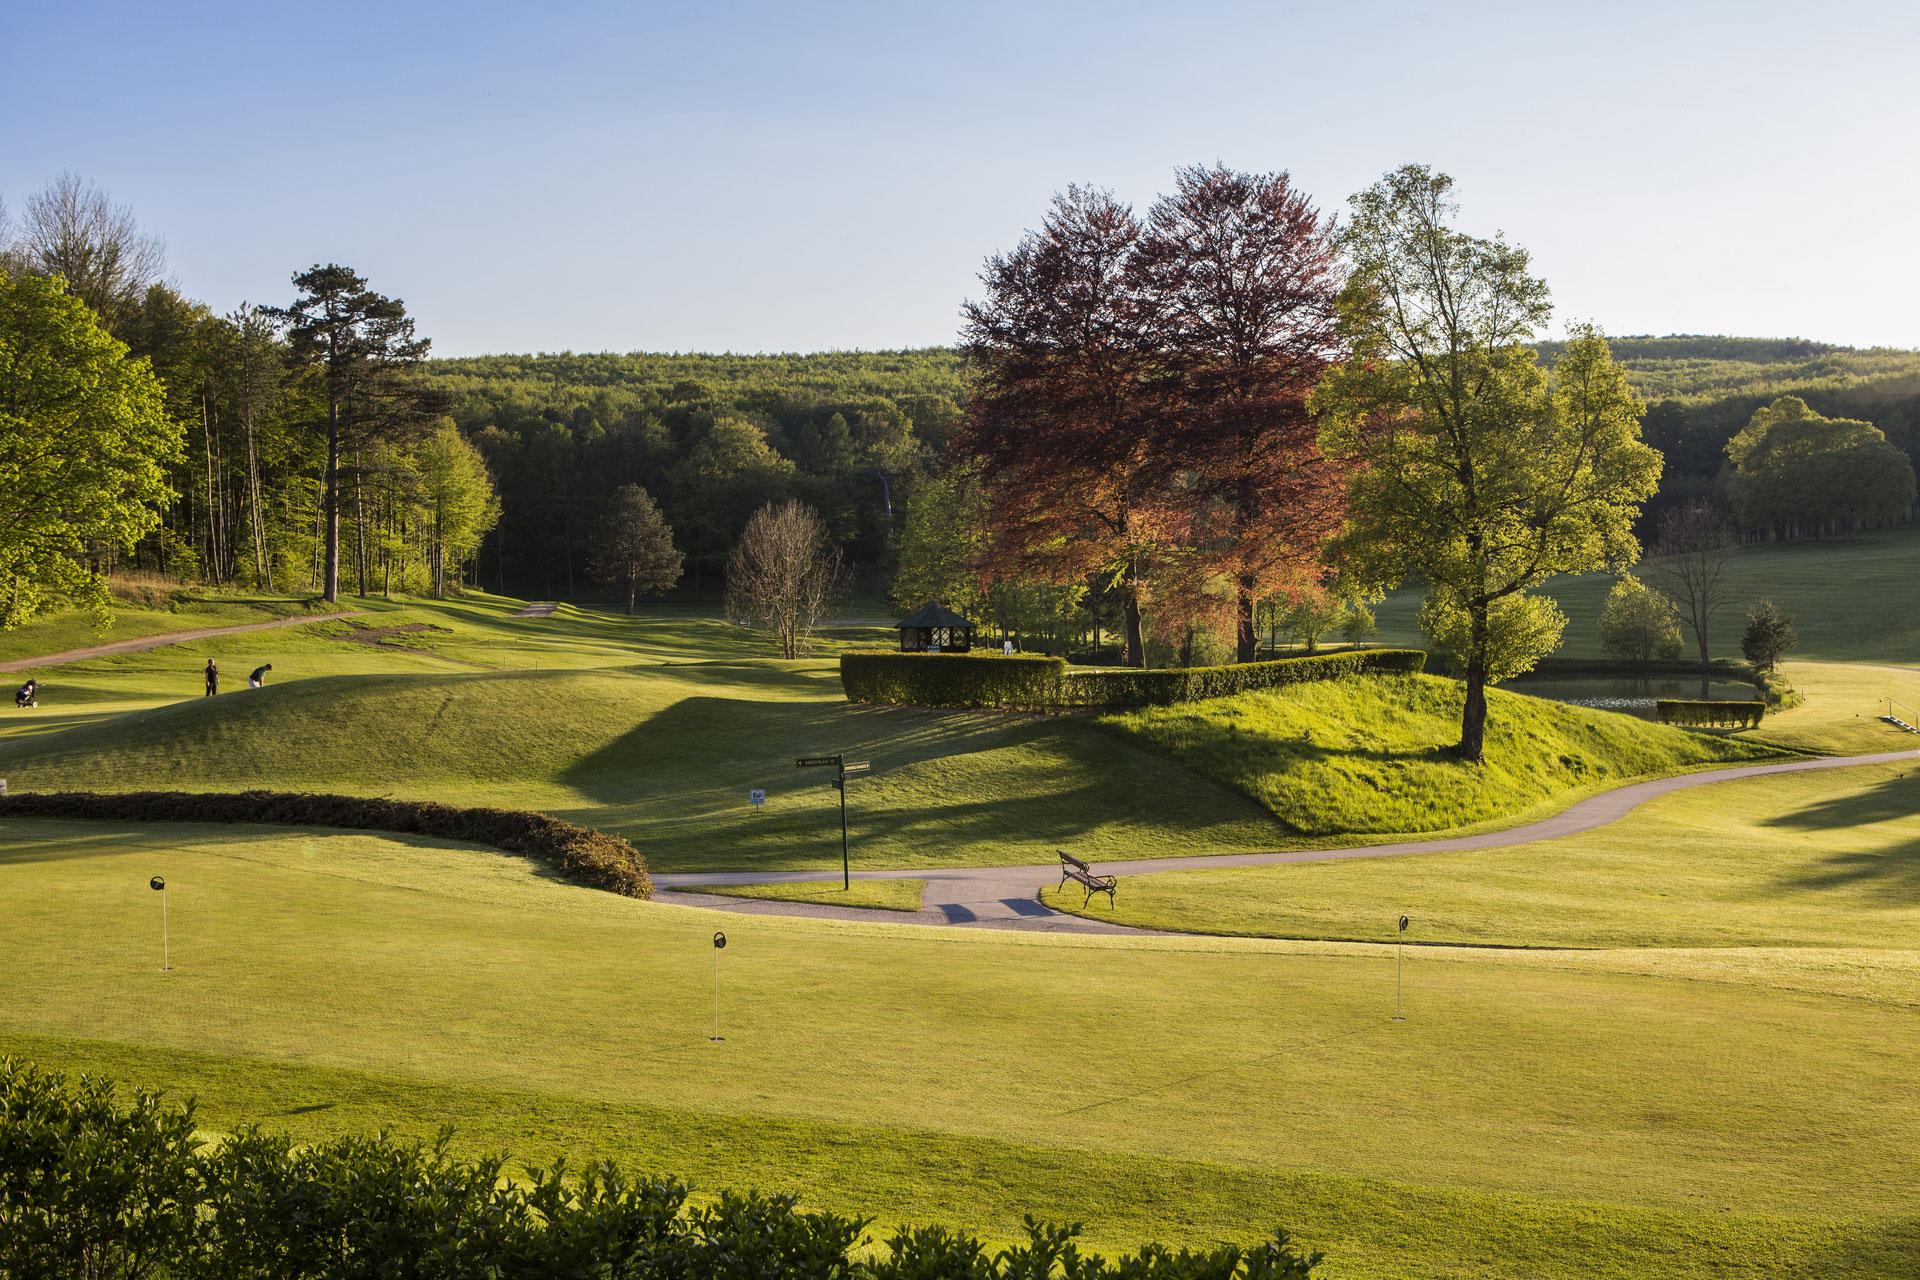 Golfplatz Enzesfeld